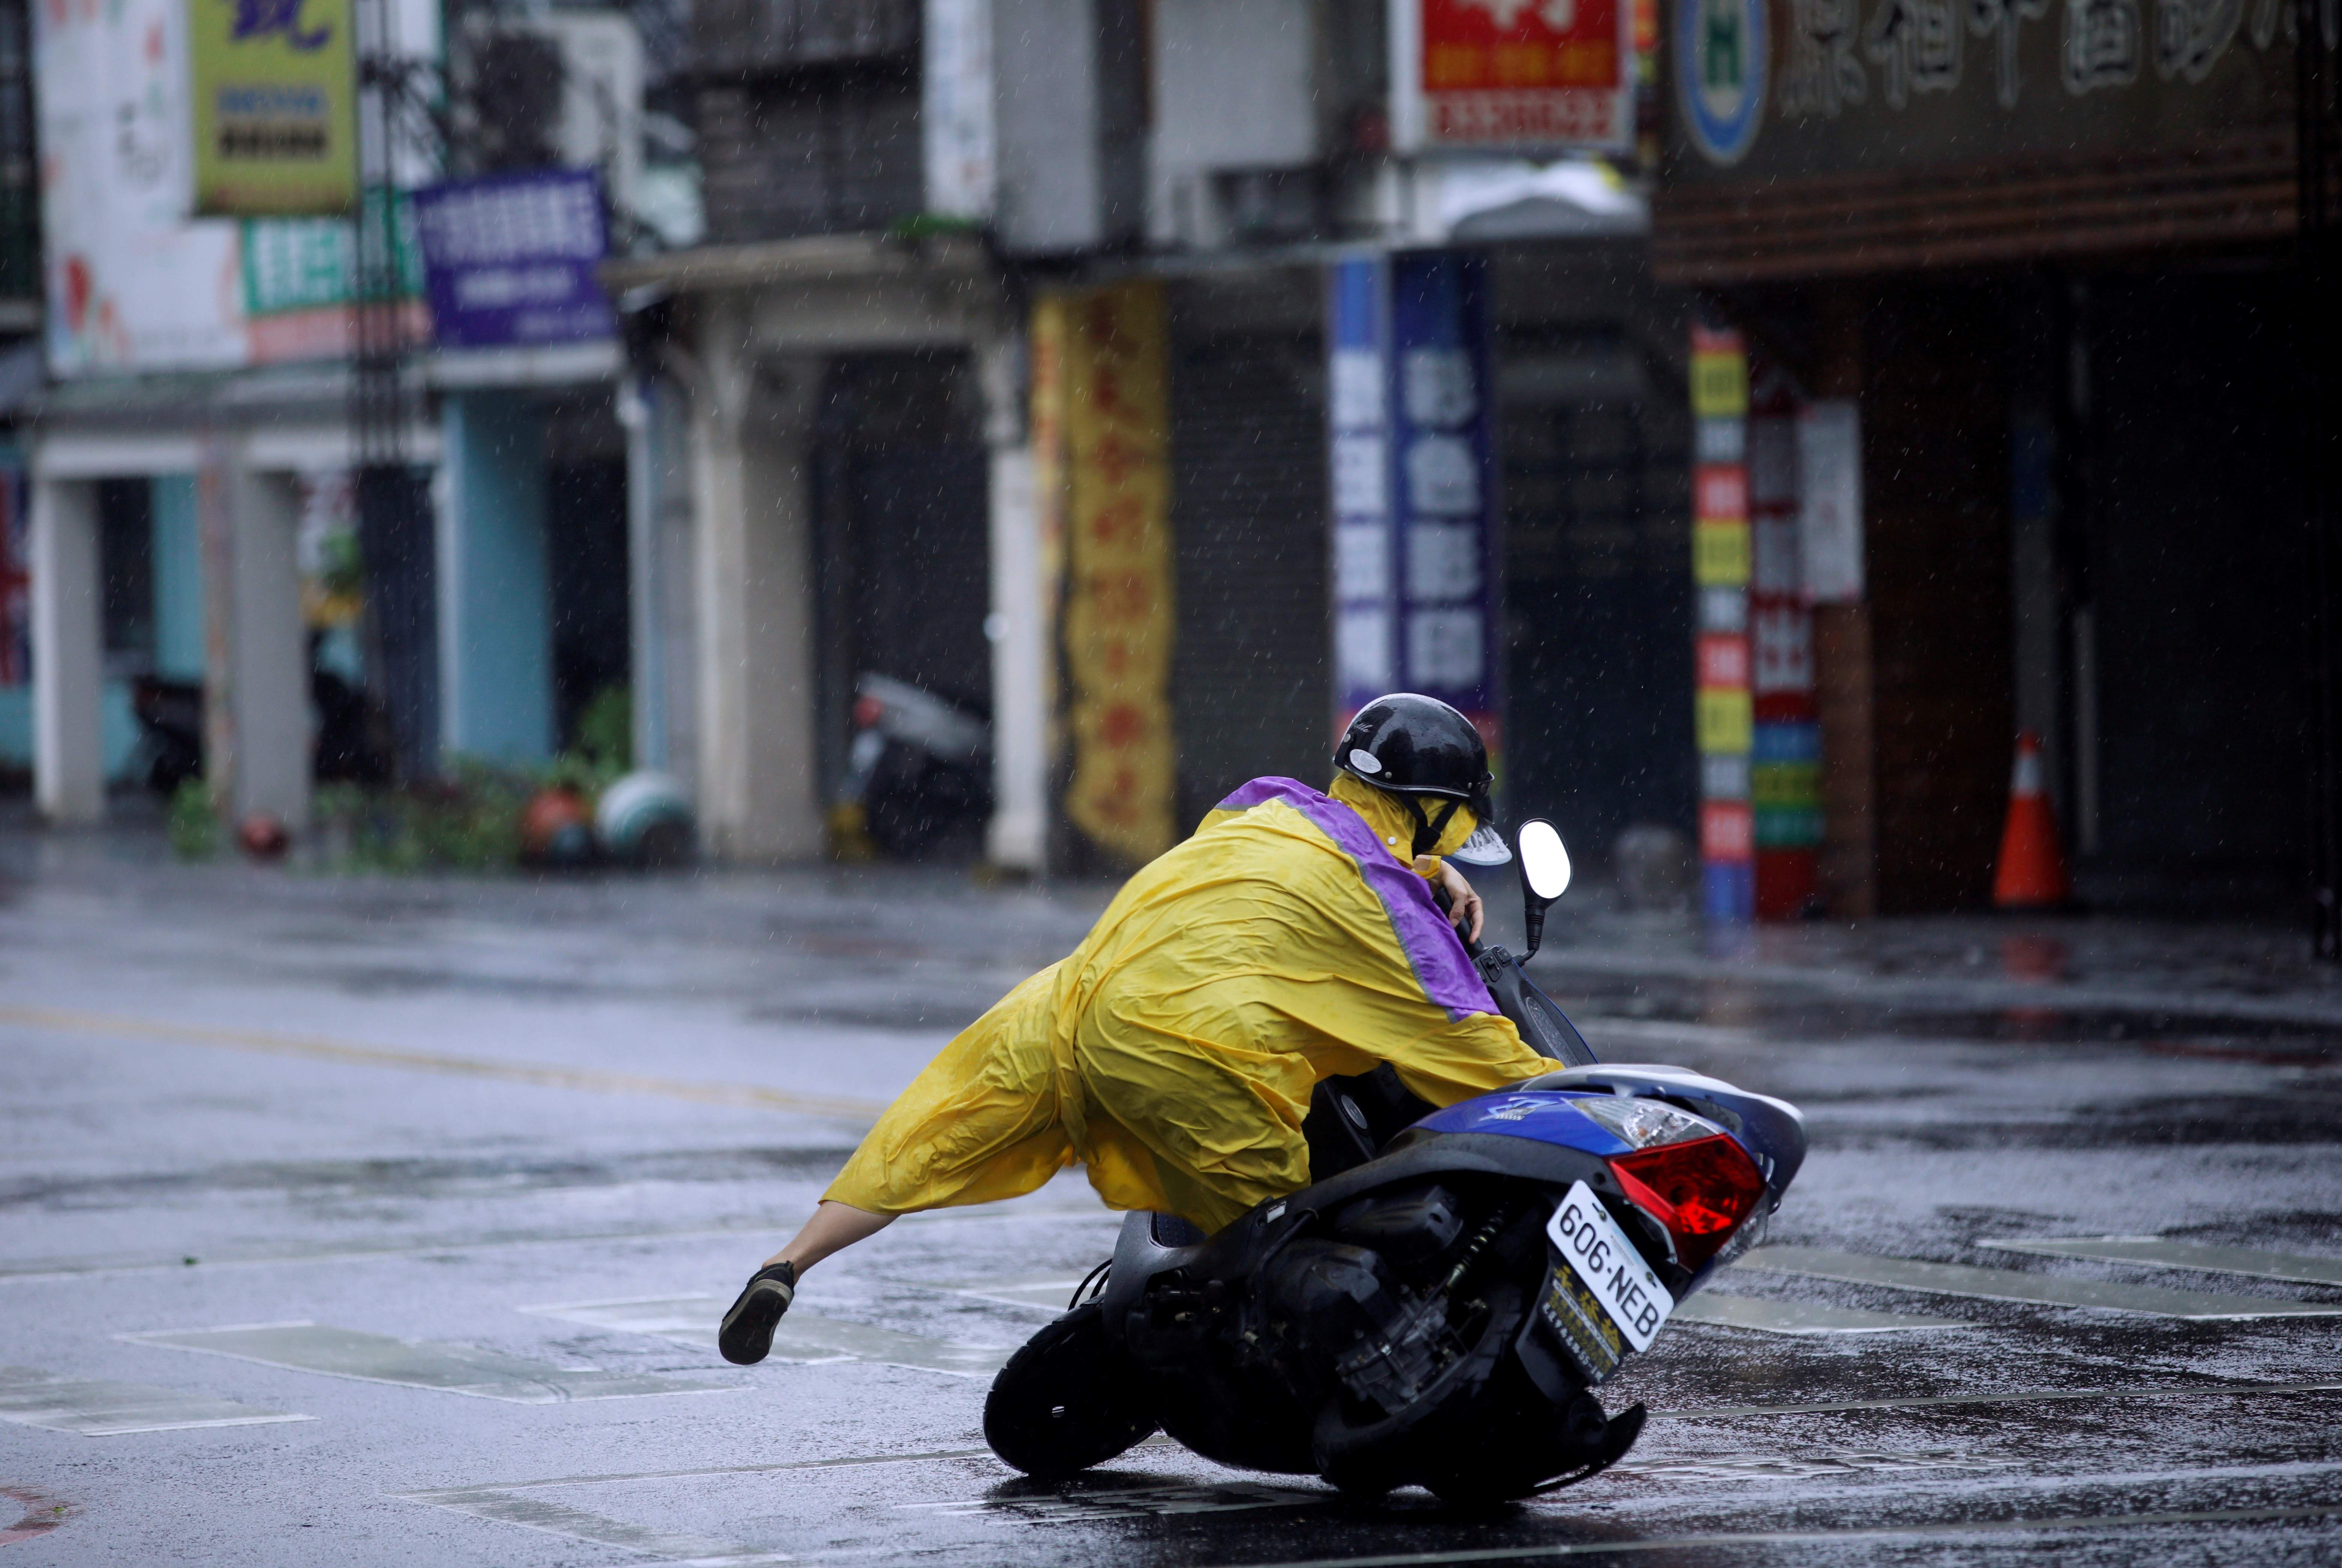 taiwan-tifon-megi-motociclista-770x420-reuters.jpg